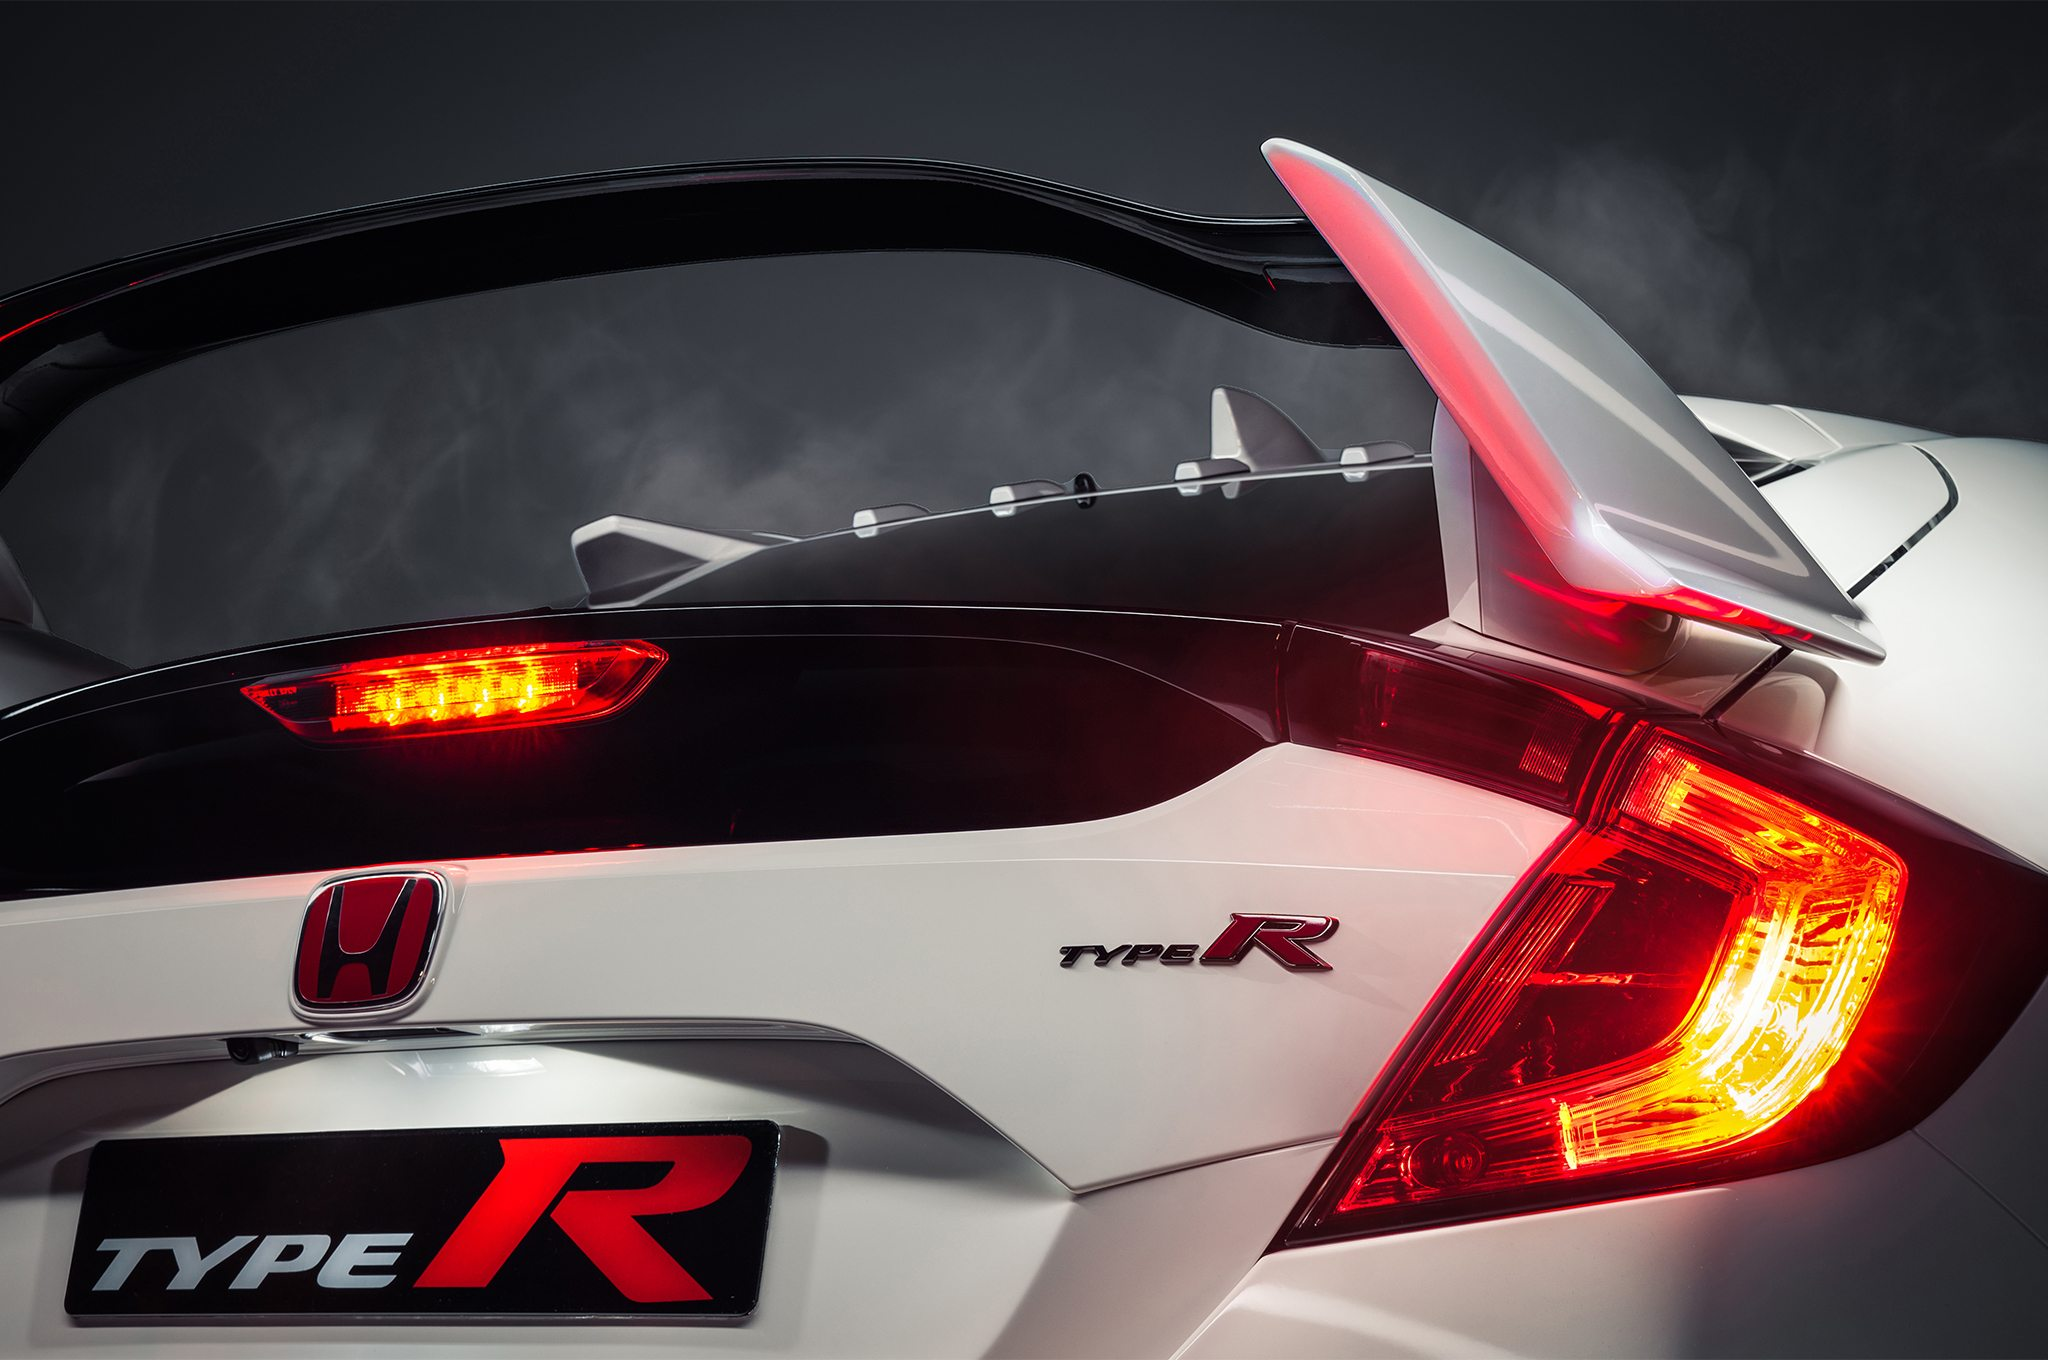 2017-Honda-Civic-Type-R-rear-end-detail